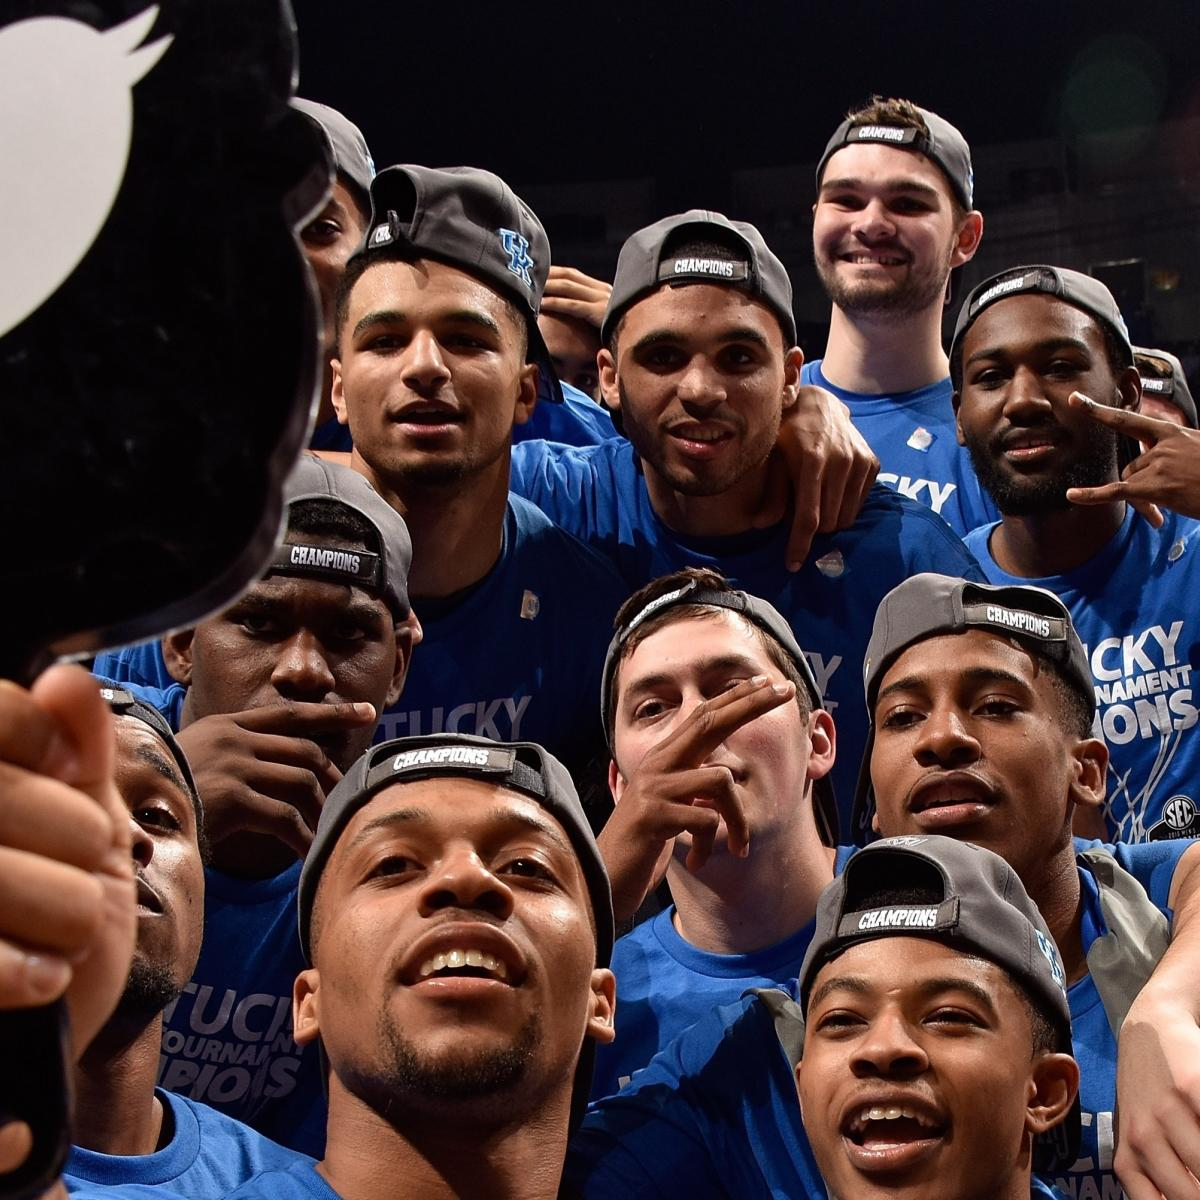 Flipboard Sports Highlights News Now: 10 Ways Social Media Ruined Sports